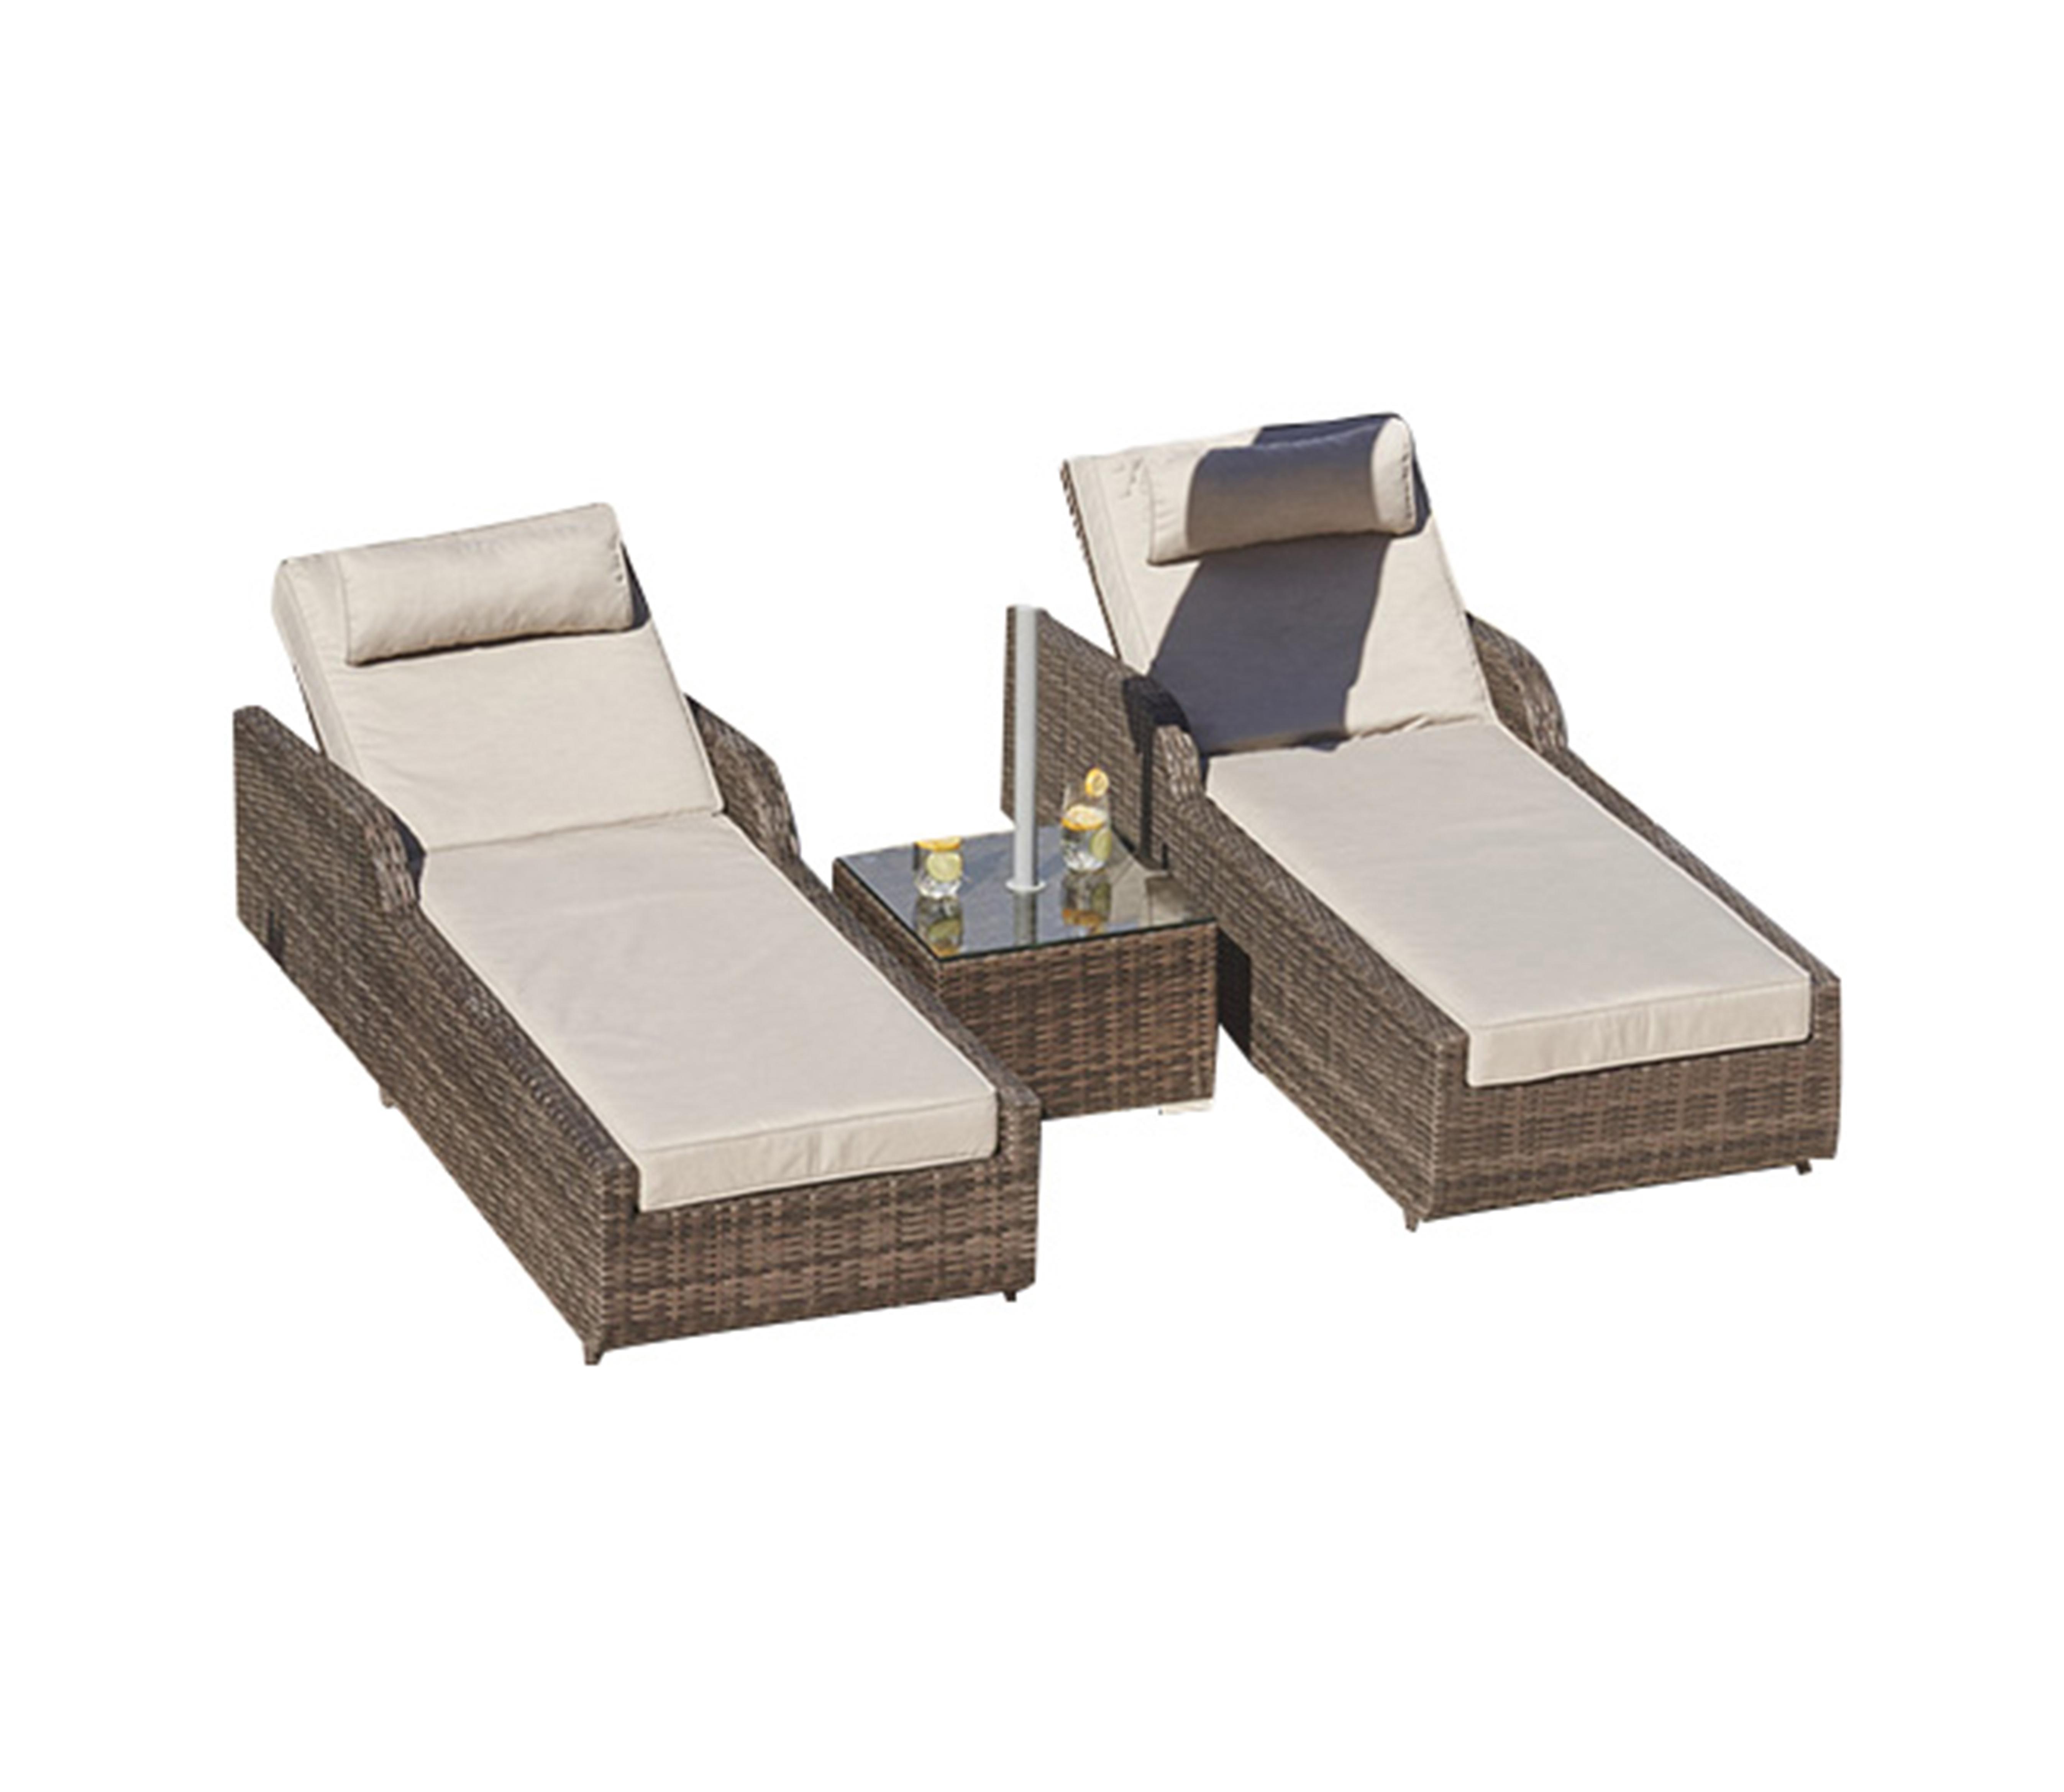 Outdoor Swimming Pool Rattan Furniture Sunlounger Set Buy Sunlounger Outdoor Furniture Outdoor Sunlounger Product On Alibaba Com